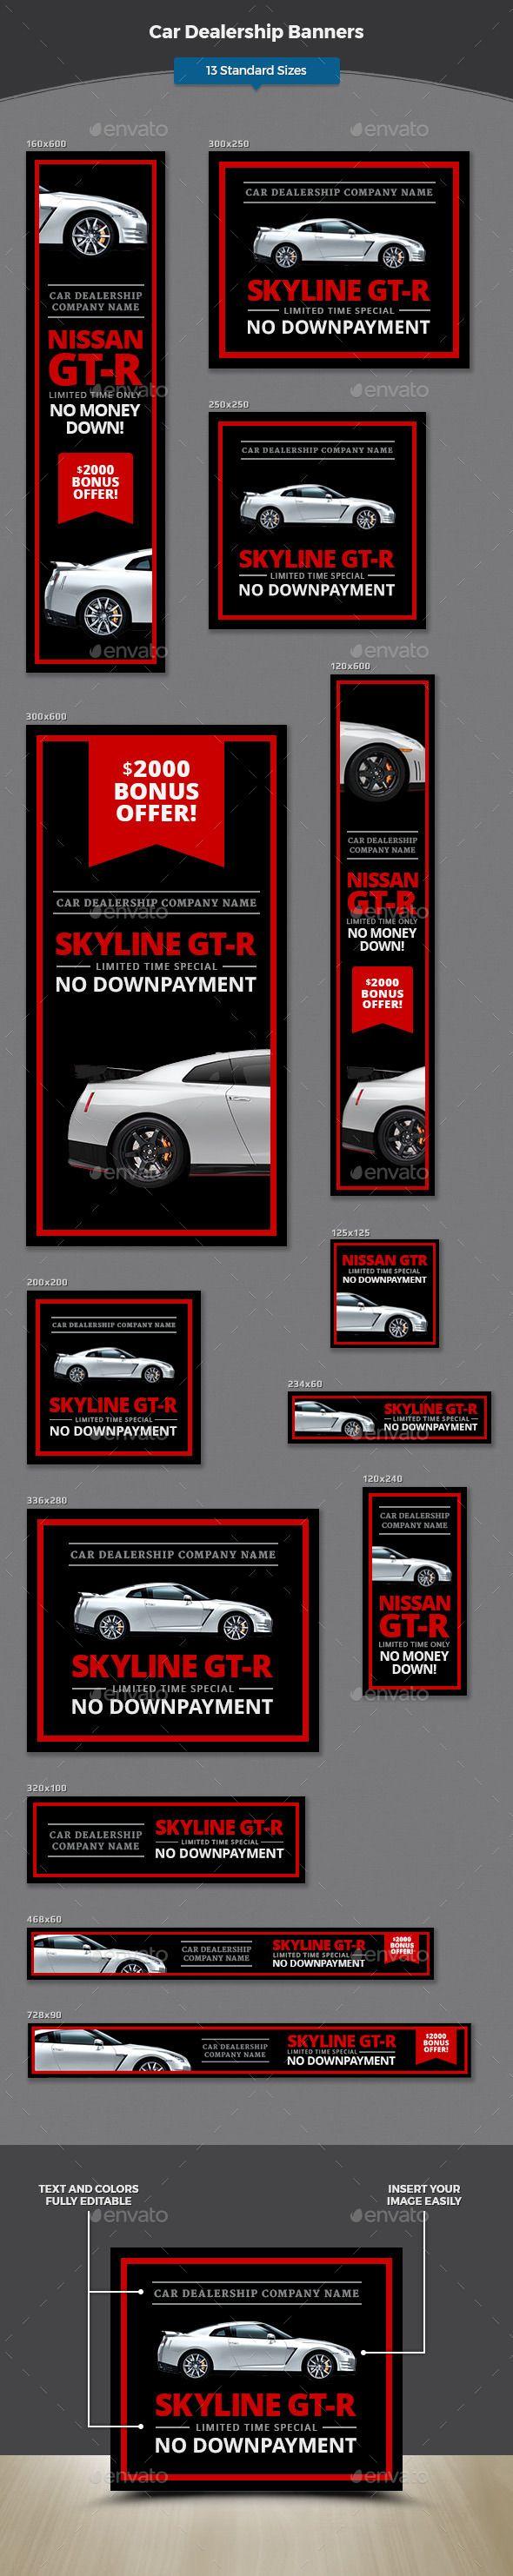 Best Car Dealerships Ideas On Pinterest Car Insurance - Car signs and namesideas name of car on wwwpeculiarpurlscom